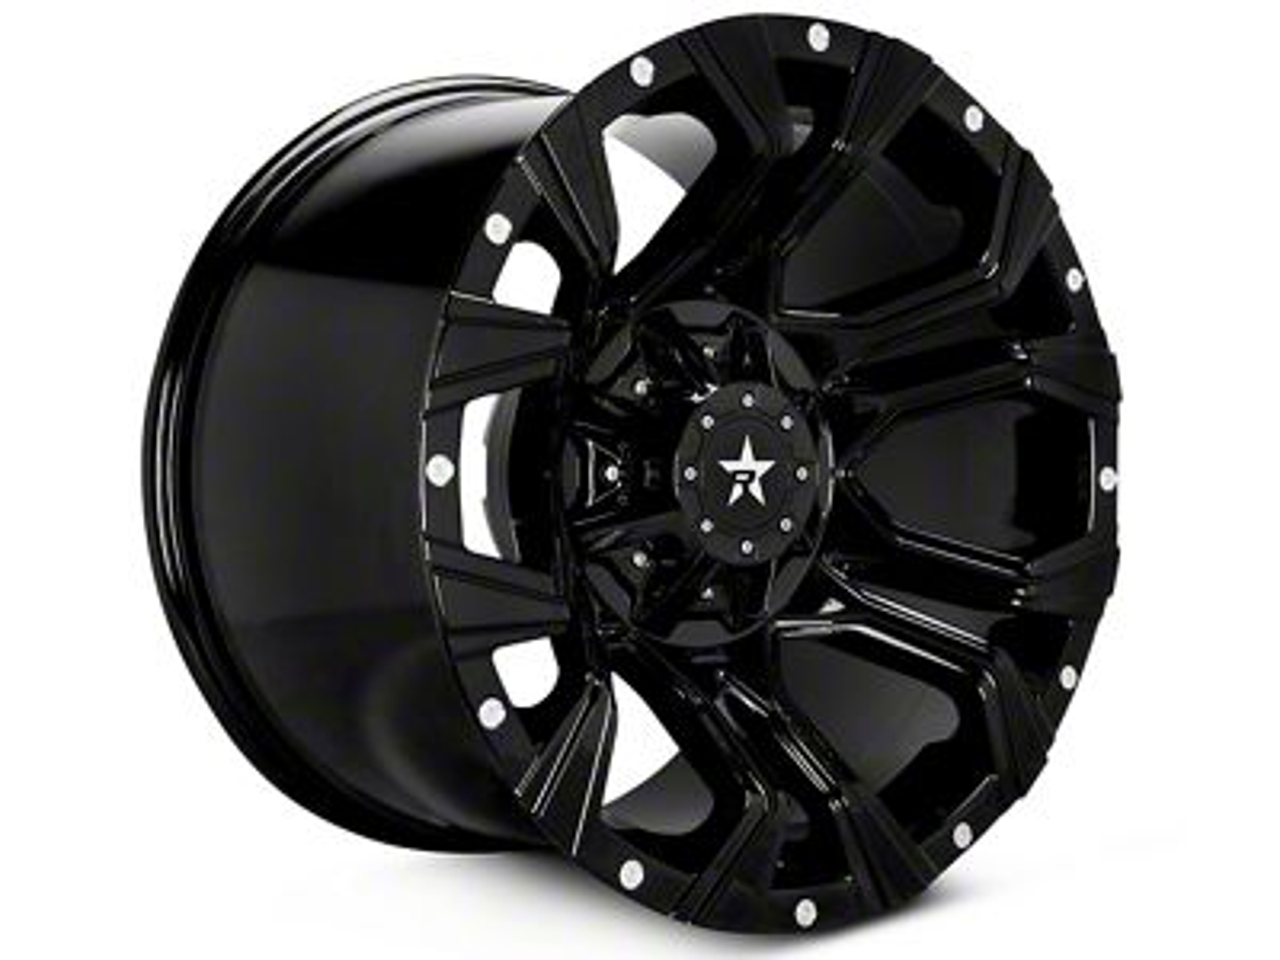 RBP 64R Widow Black Machined 5-Lug Wheel - 20x10 (02-18 RAM 1500, Excluding Mega Cab)